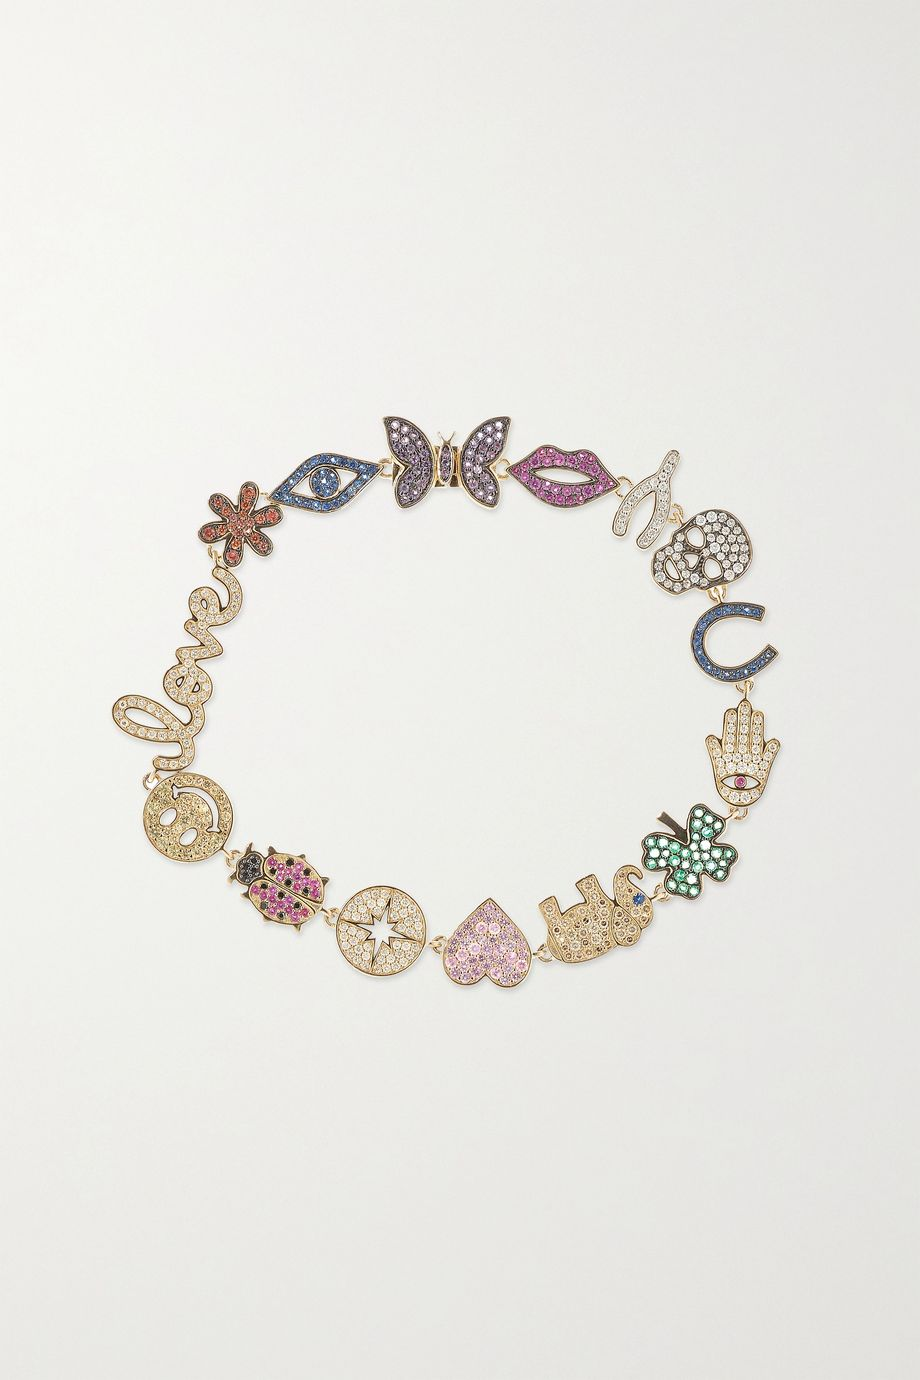 Sydney Evan 14-karat gold, diamond and sapphire bracelet